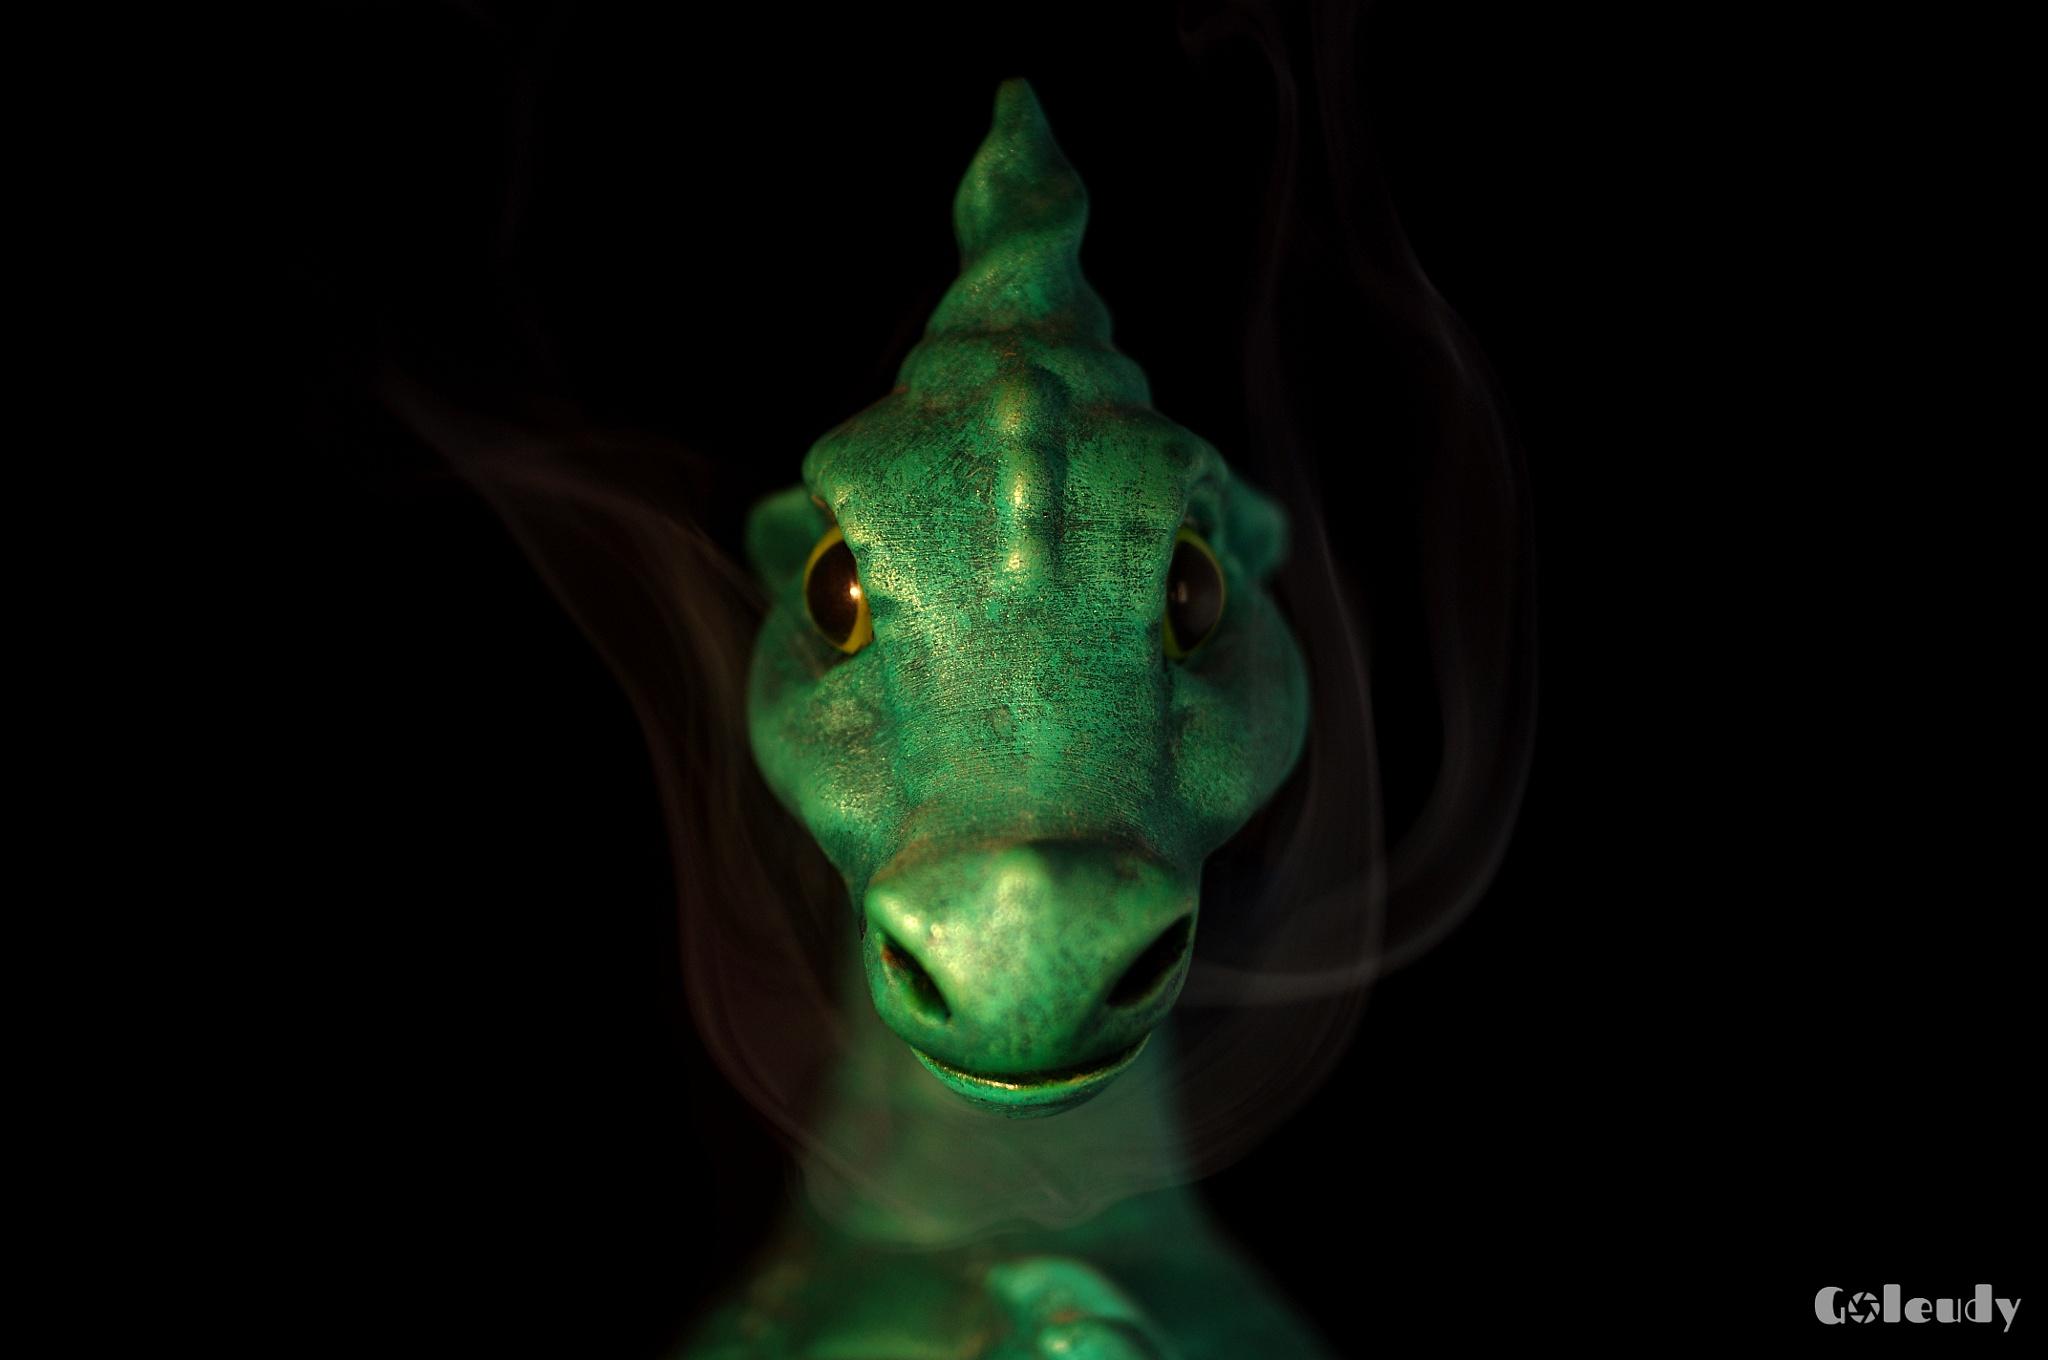 The Smoking Dragon by Goleudy